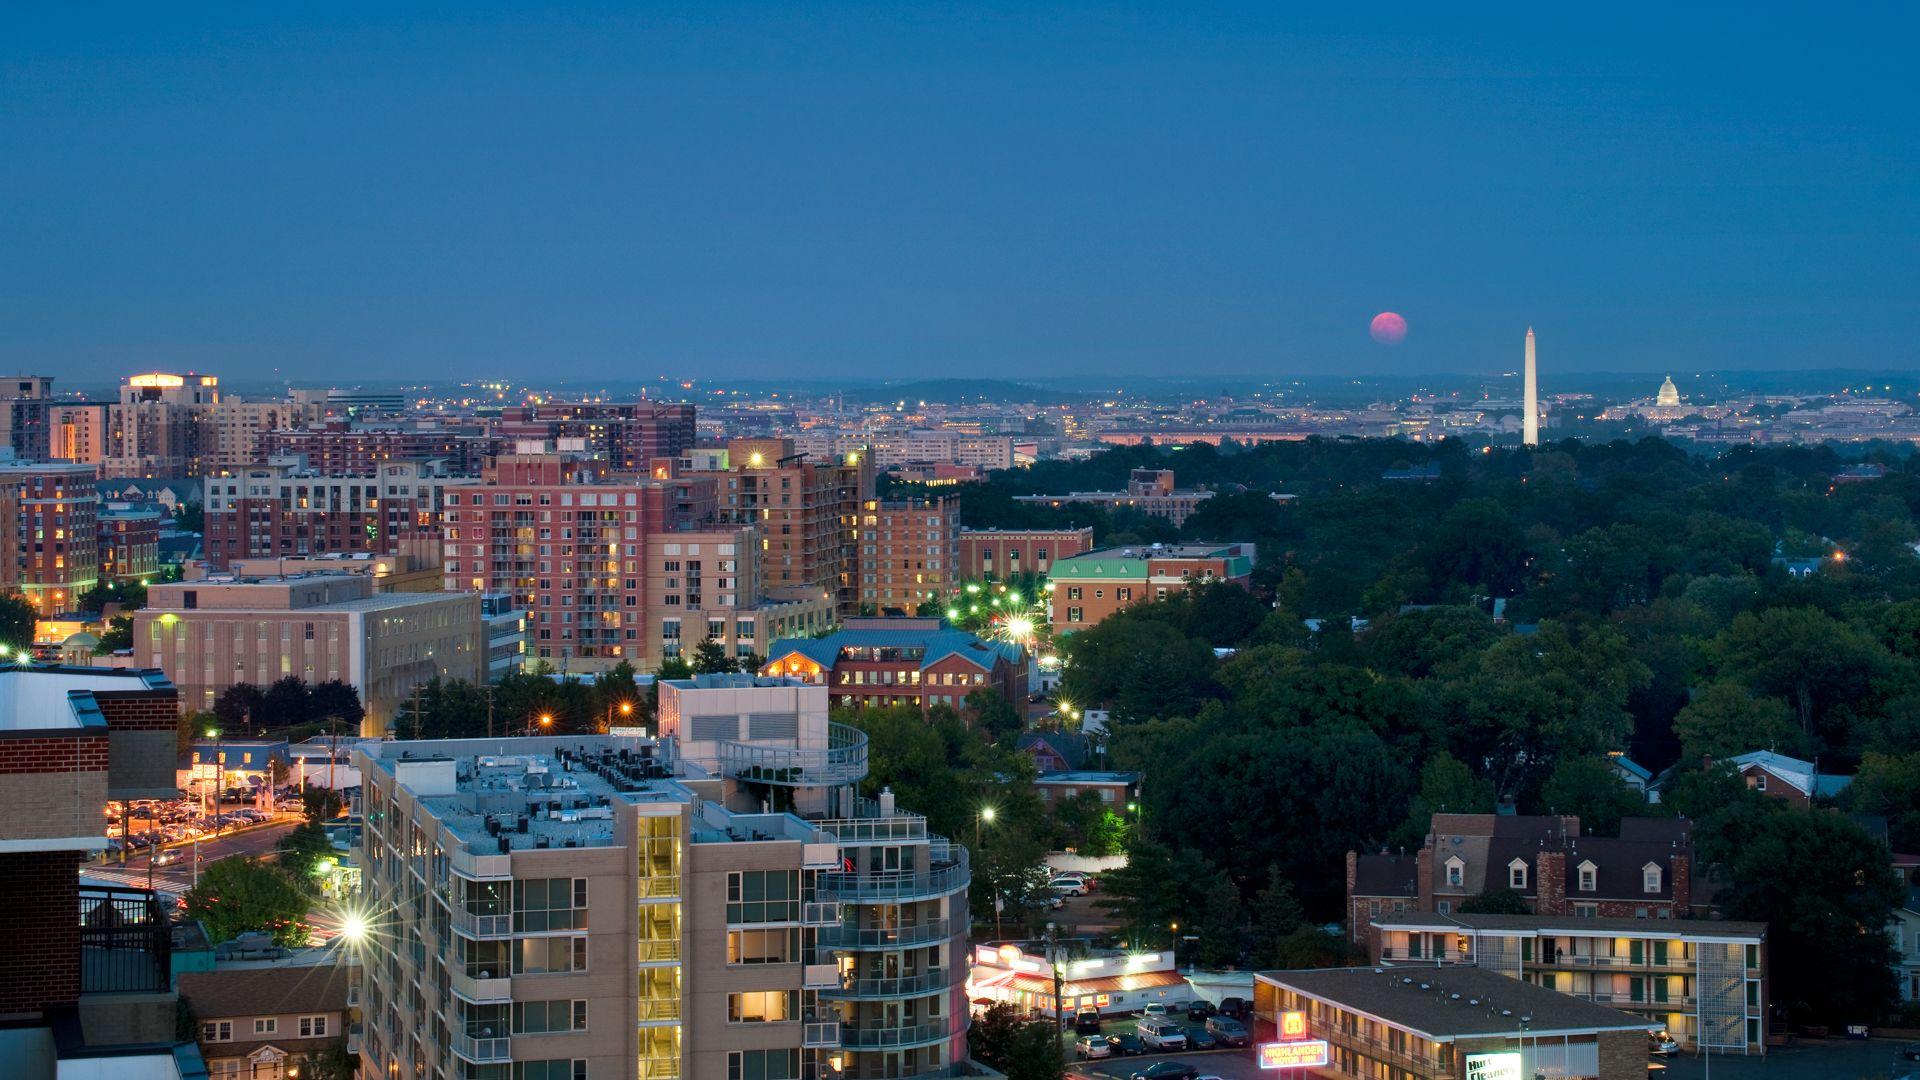 Virginia Square Apartments - Views